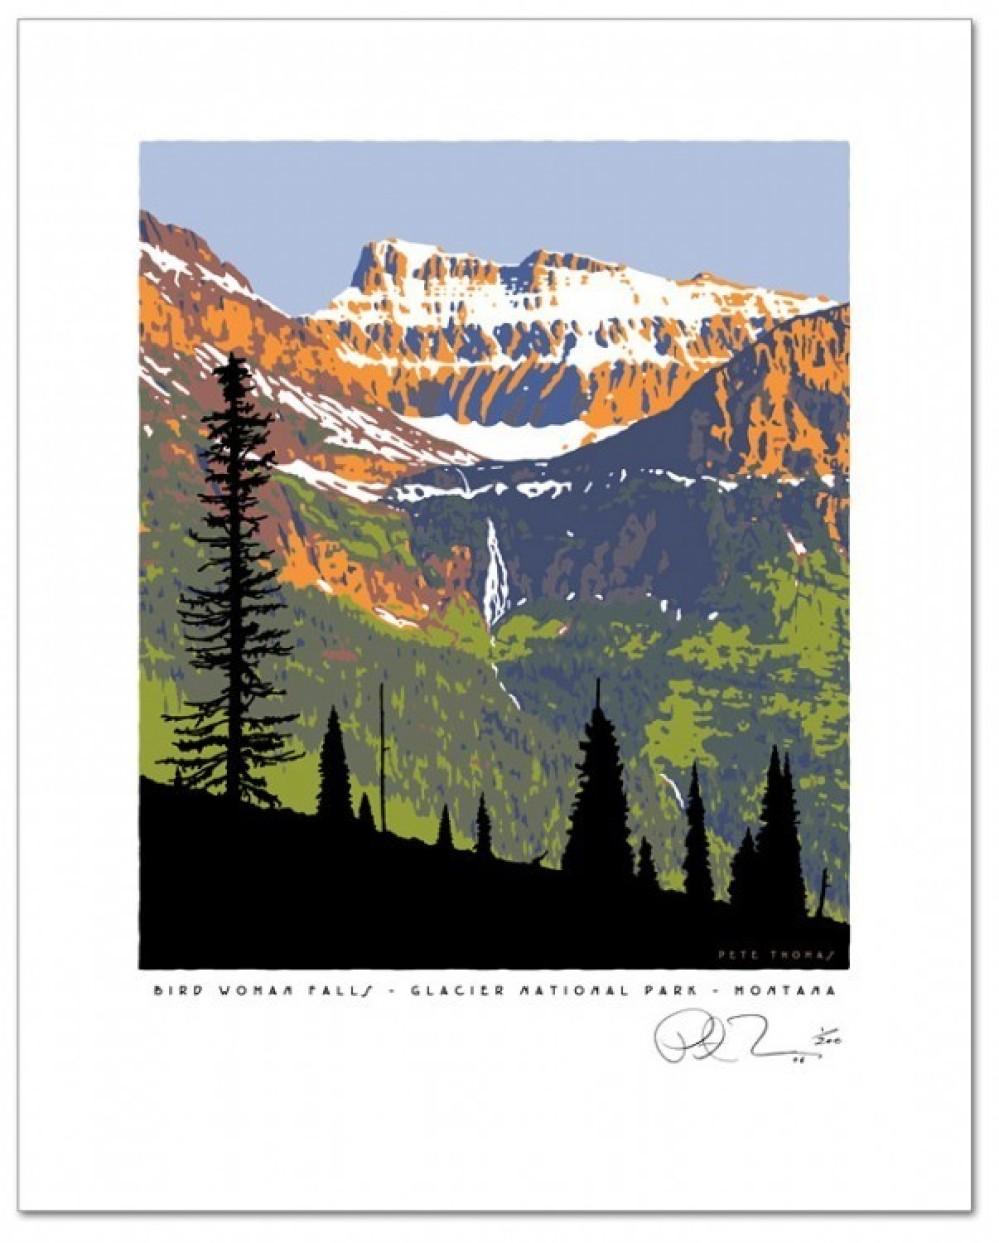 Bird Woman Falls-Glacier Park – Pete Thomas